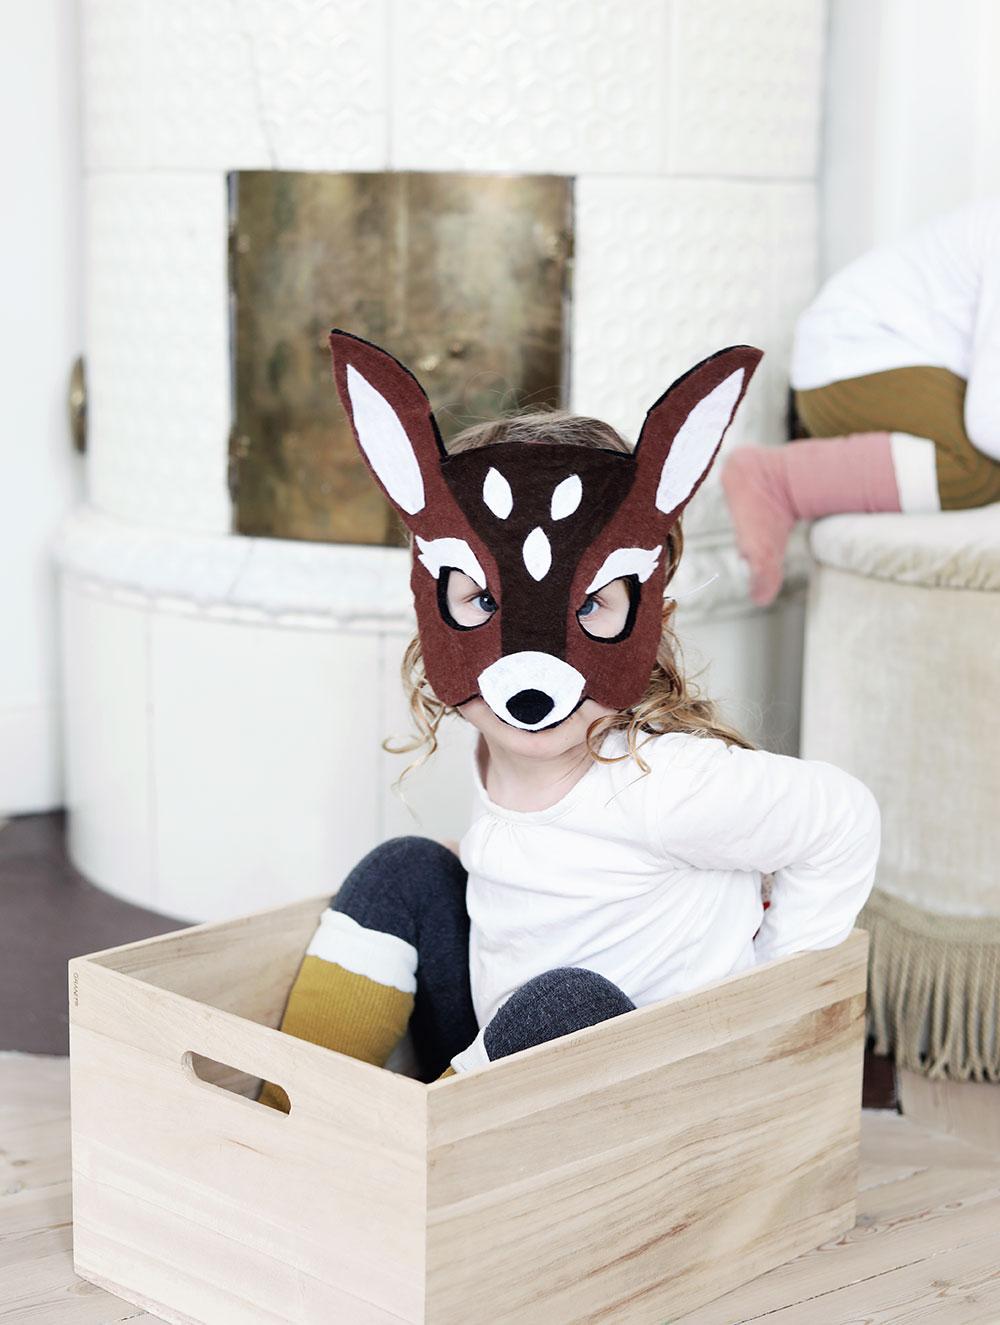 DIY djurmask bambi leksak mask barn leksak leksaker filttyg rådjur steg-för-steg kids toy barnrum